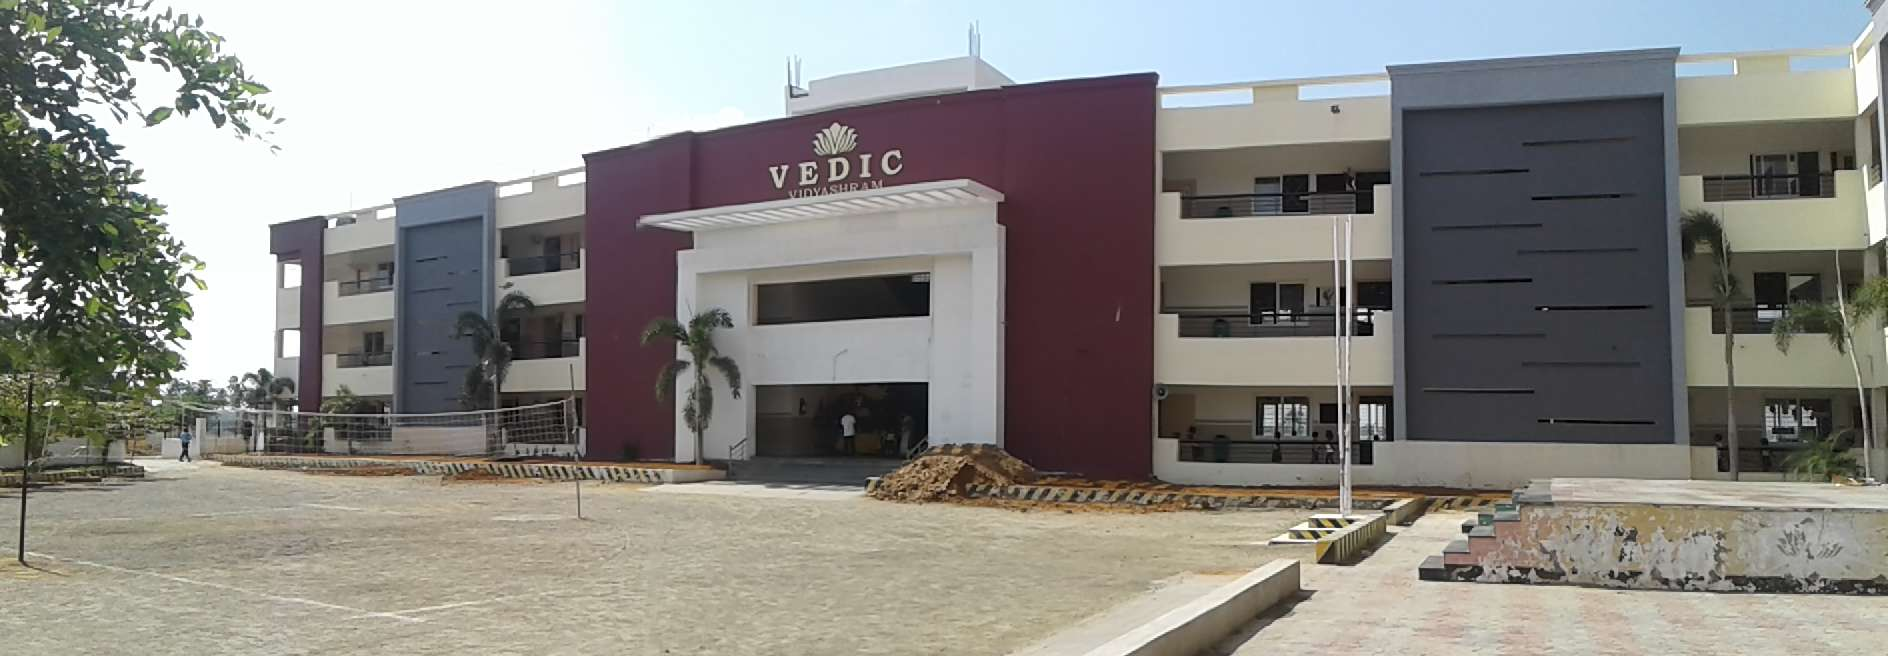 Vedic Vidyashram School No 452 1A Madurai Road Chatramputhukulam Village Thanchanallur Tirunelveli District 1930456